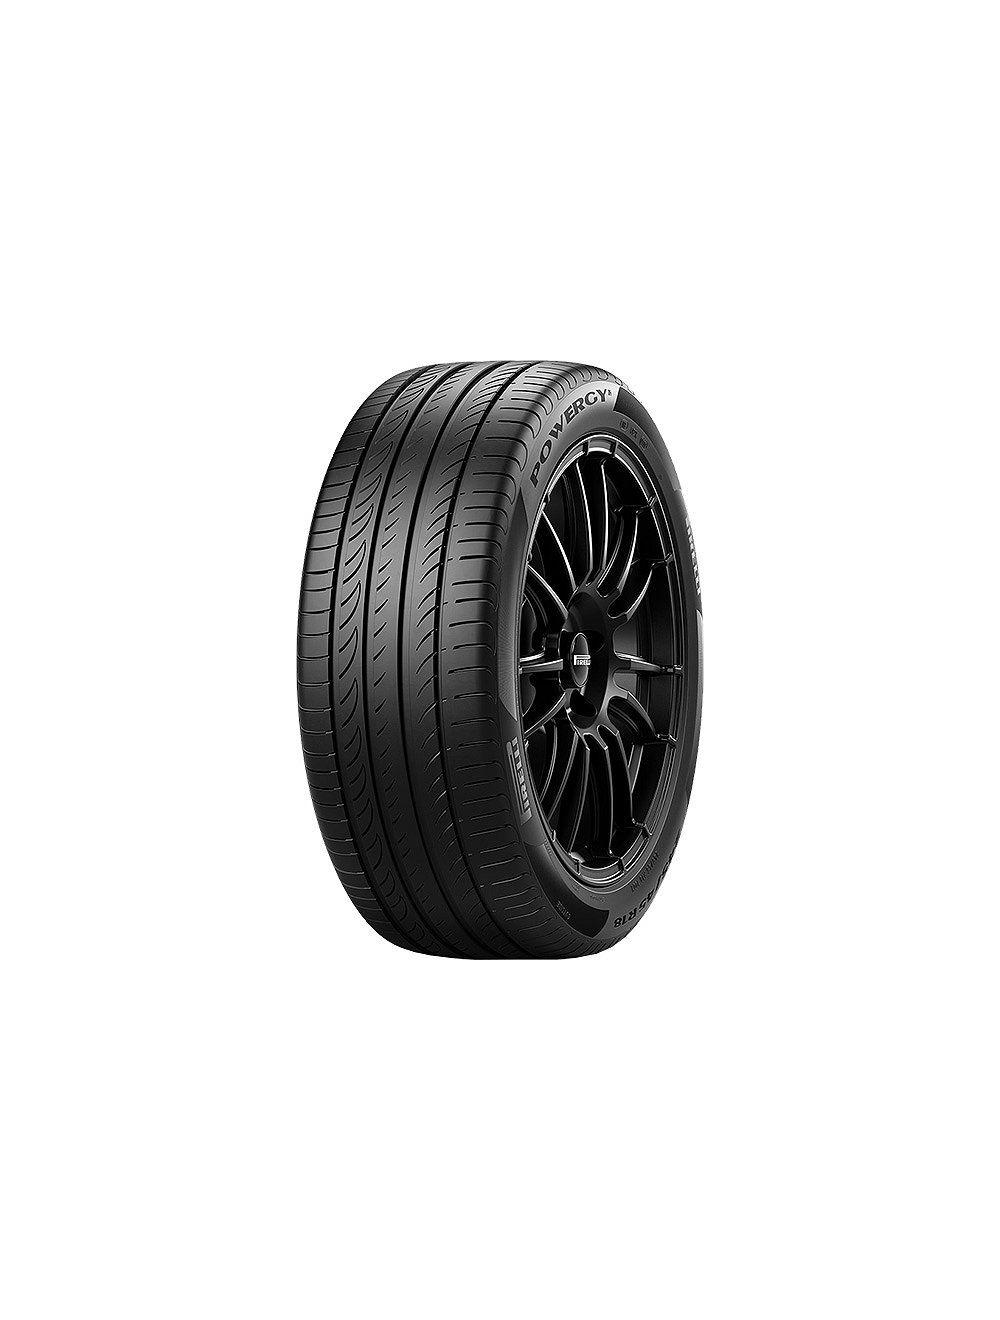 Pirelli 255/40R20 Y Powergy XL Nyári gumi